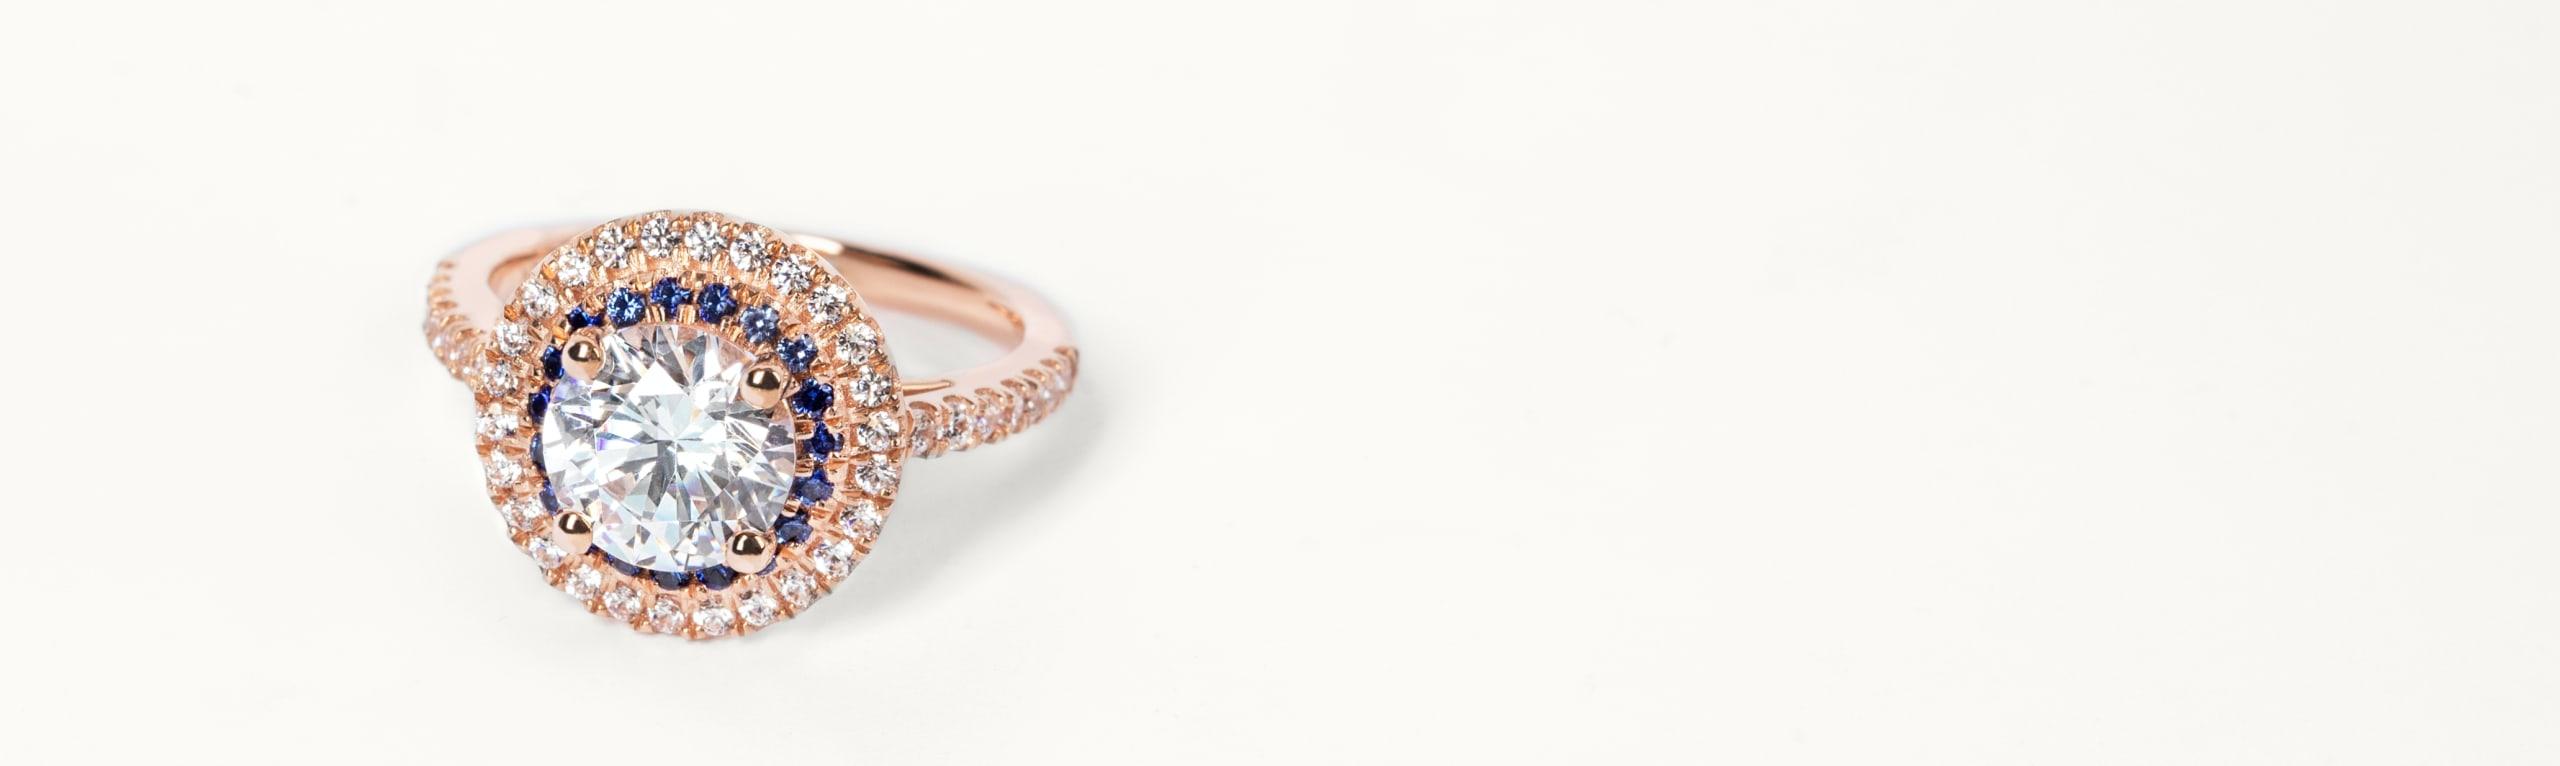 Glamorous Engagement Ring